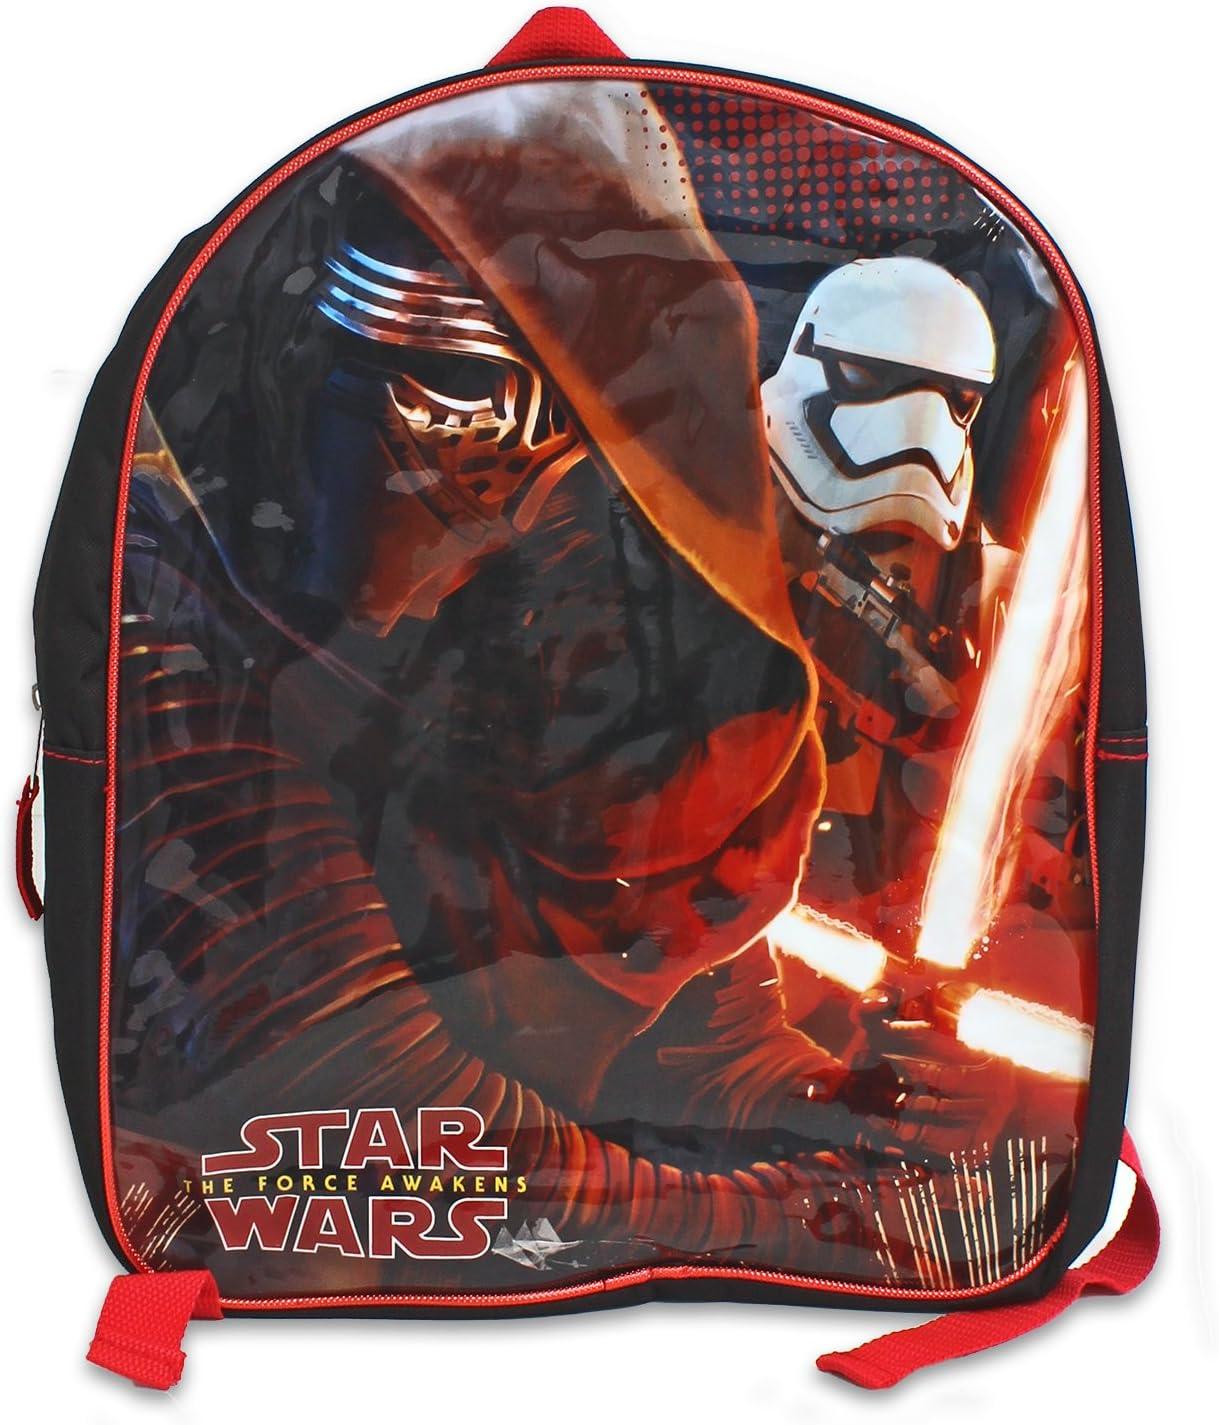 Official Disney Star Wars The Force Awakens Kylo Ren 40cm Student Backpack Bag